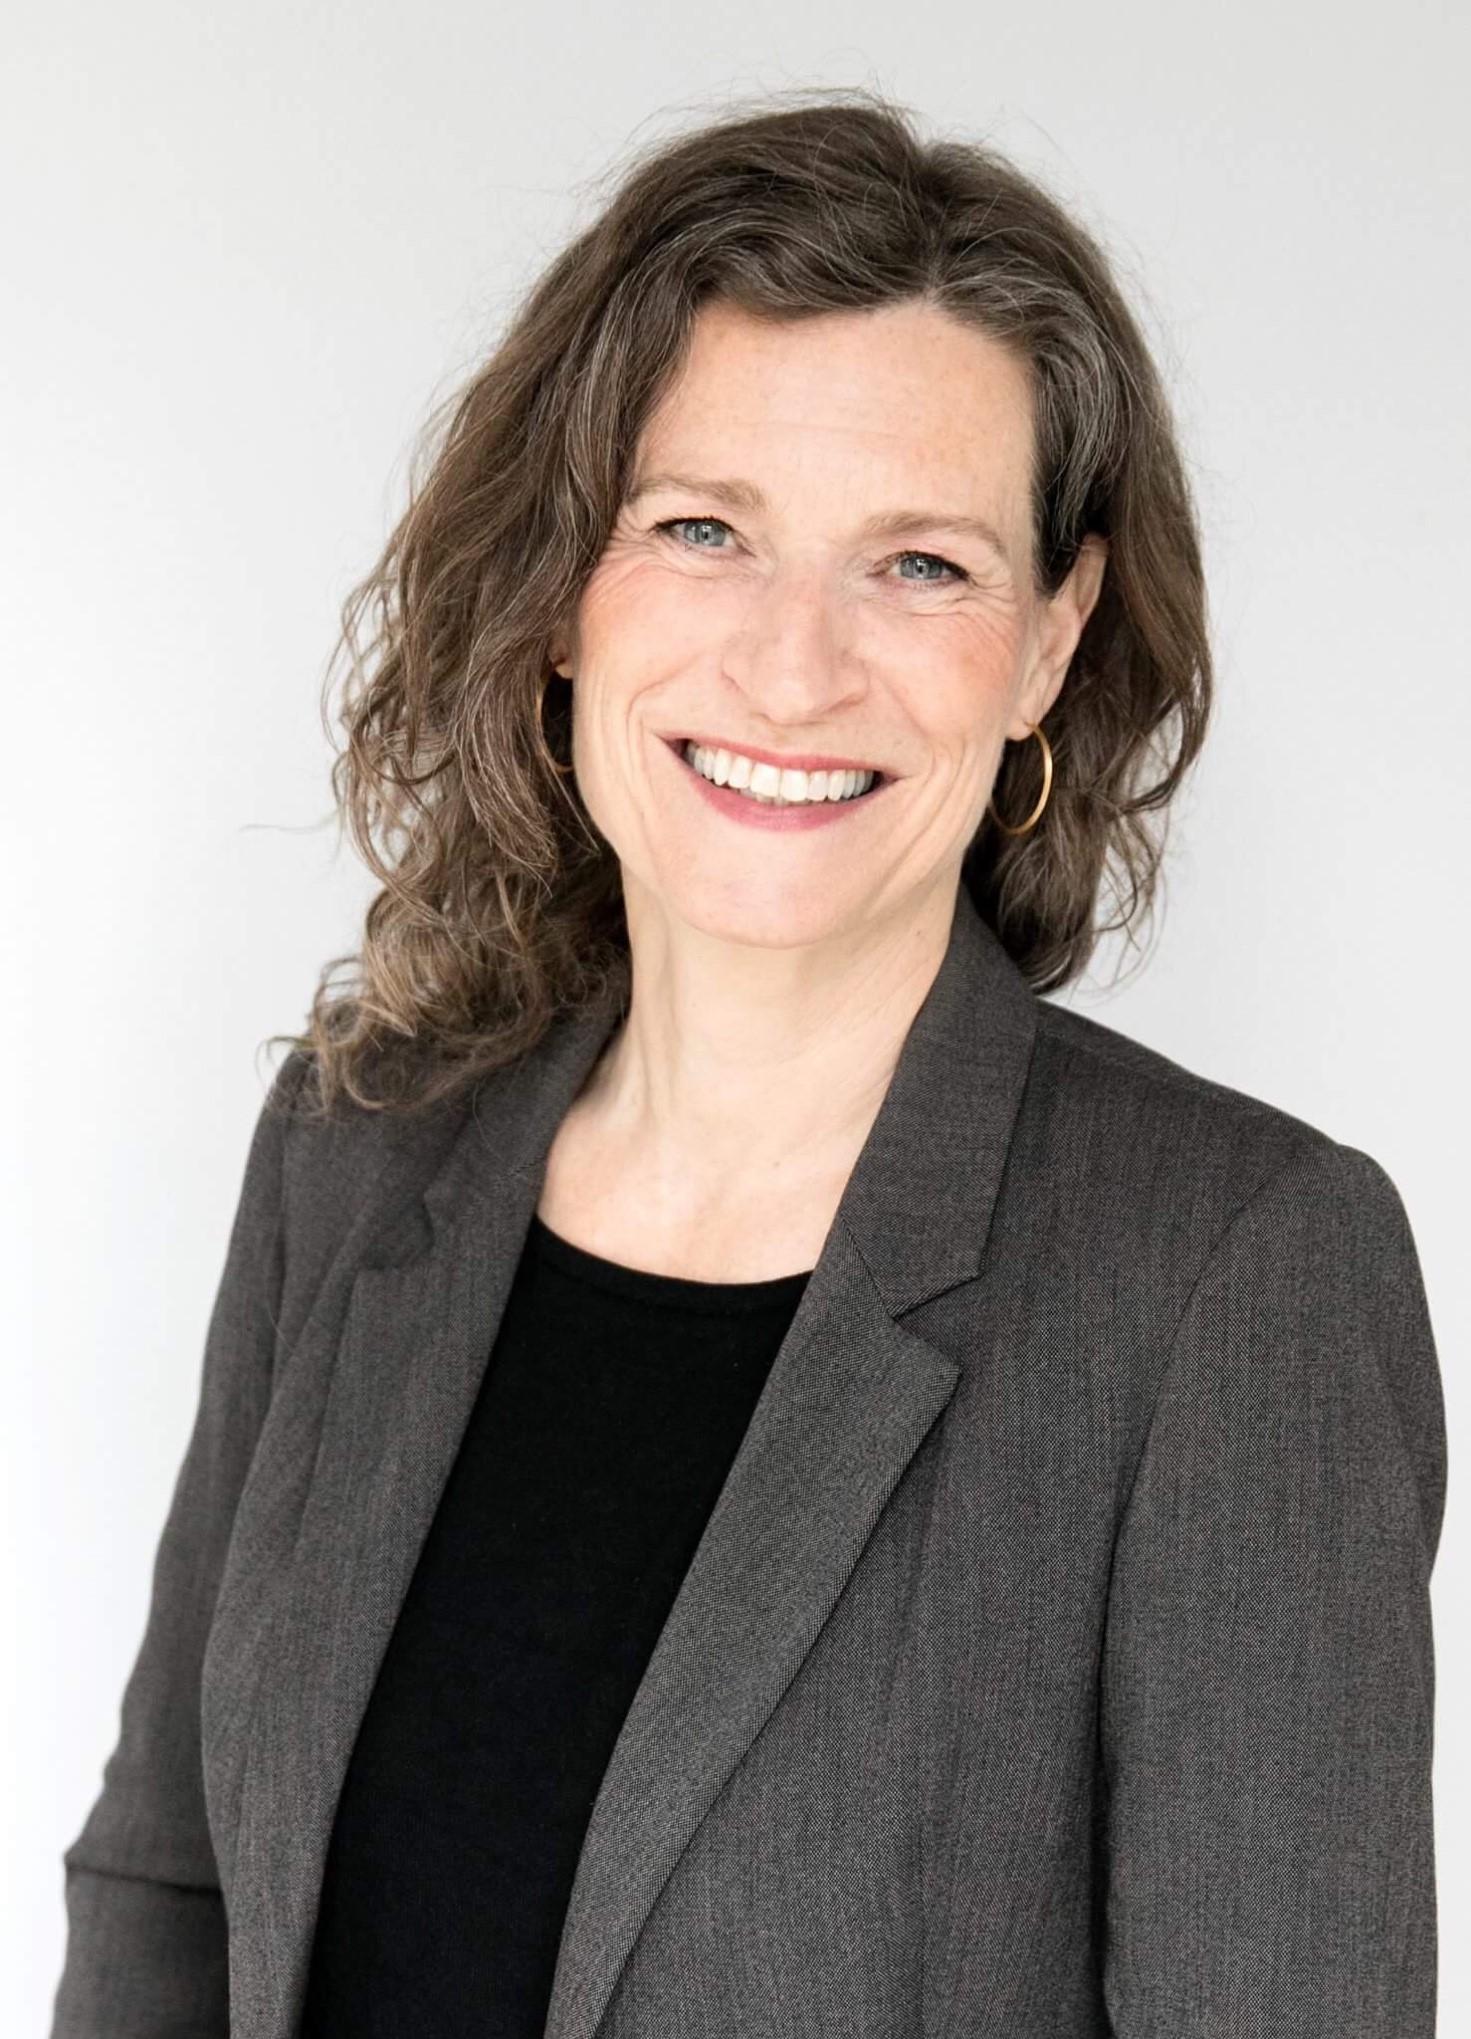 Vibeke Dueholm